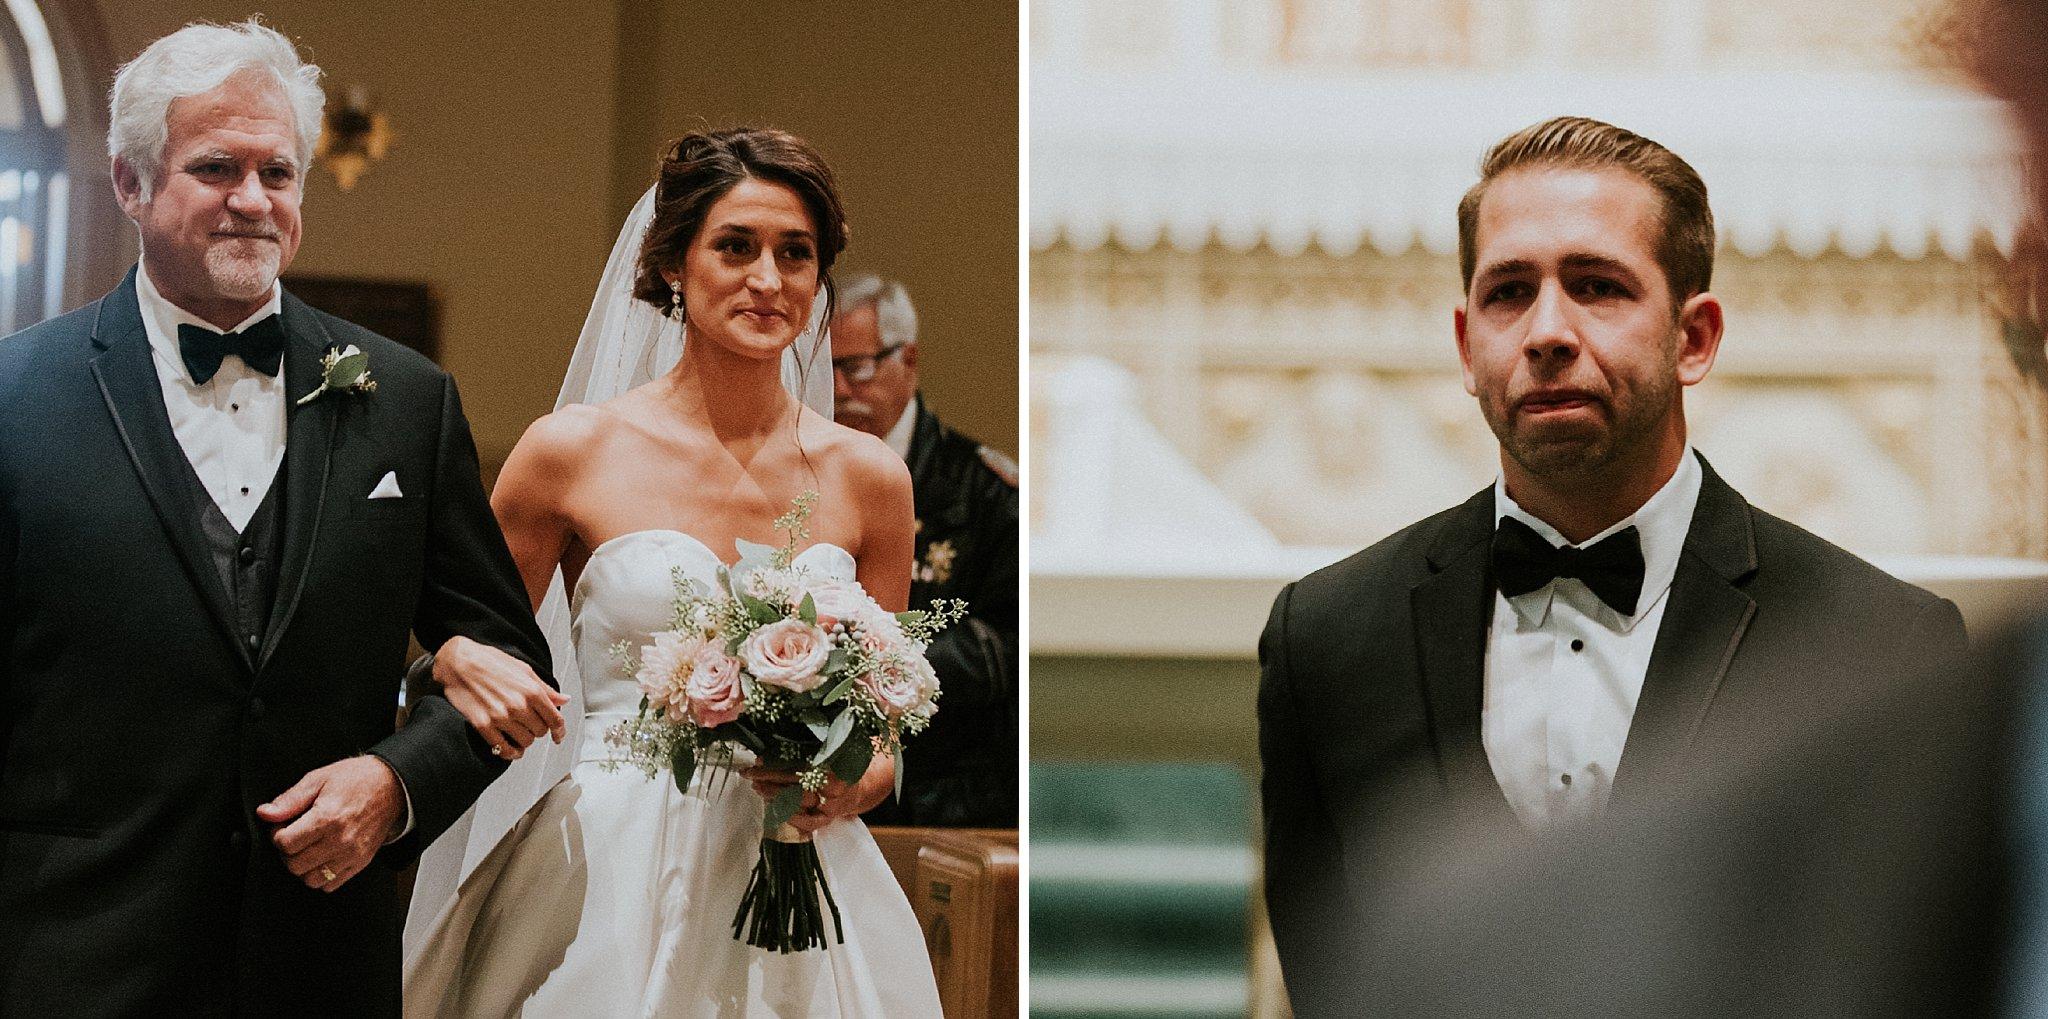 Matt-Lauren_St-Marys_Hilton-City-Center-Milwaukee-Wedding_liller-photo_0016.jpg